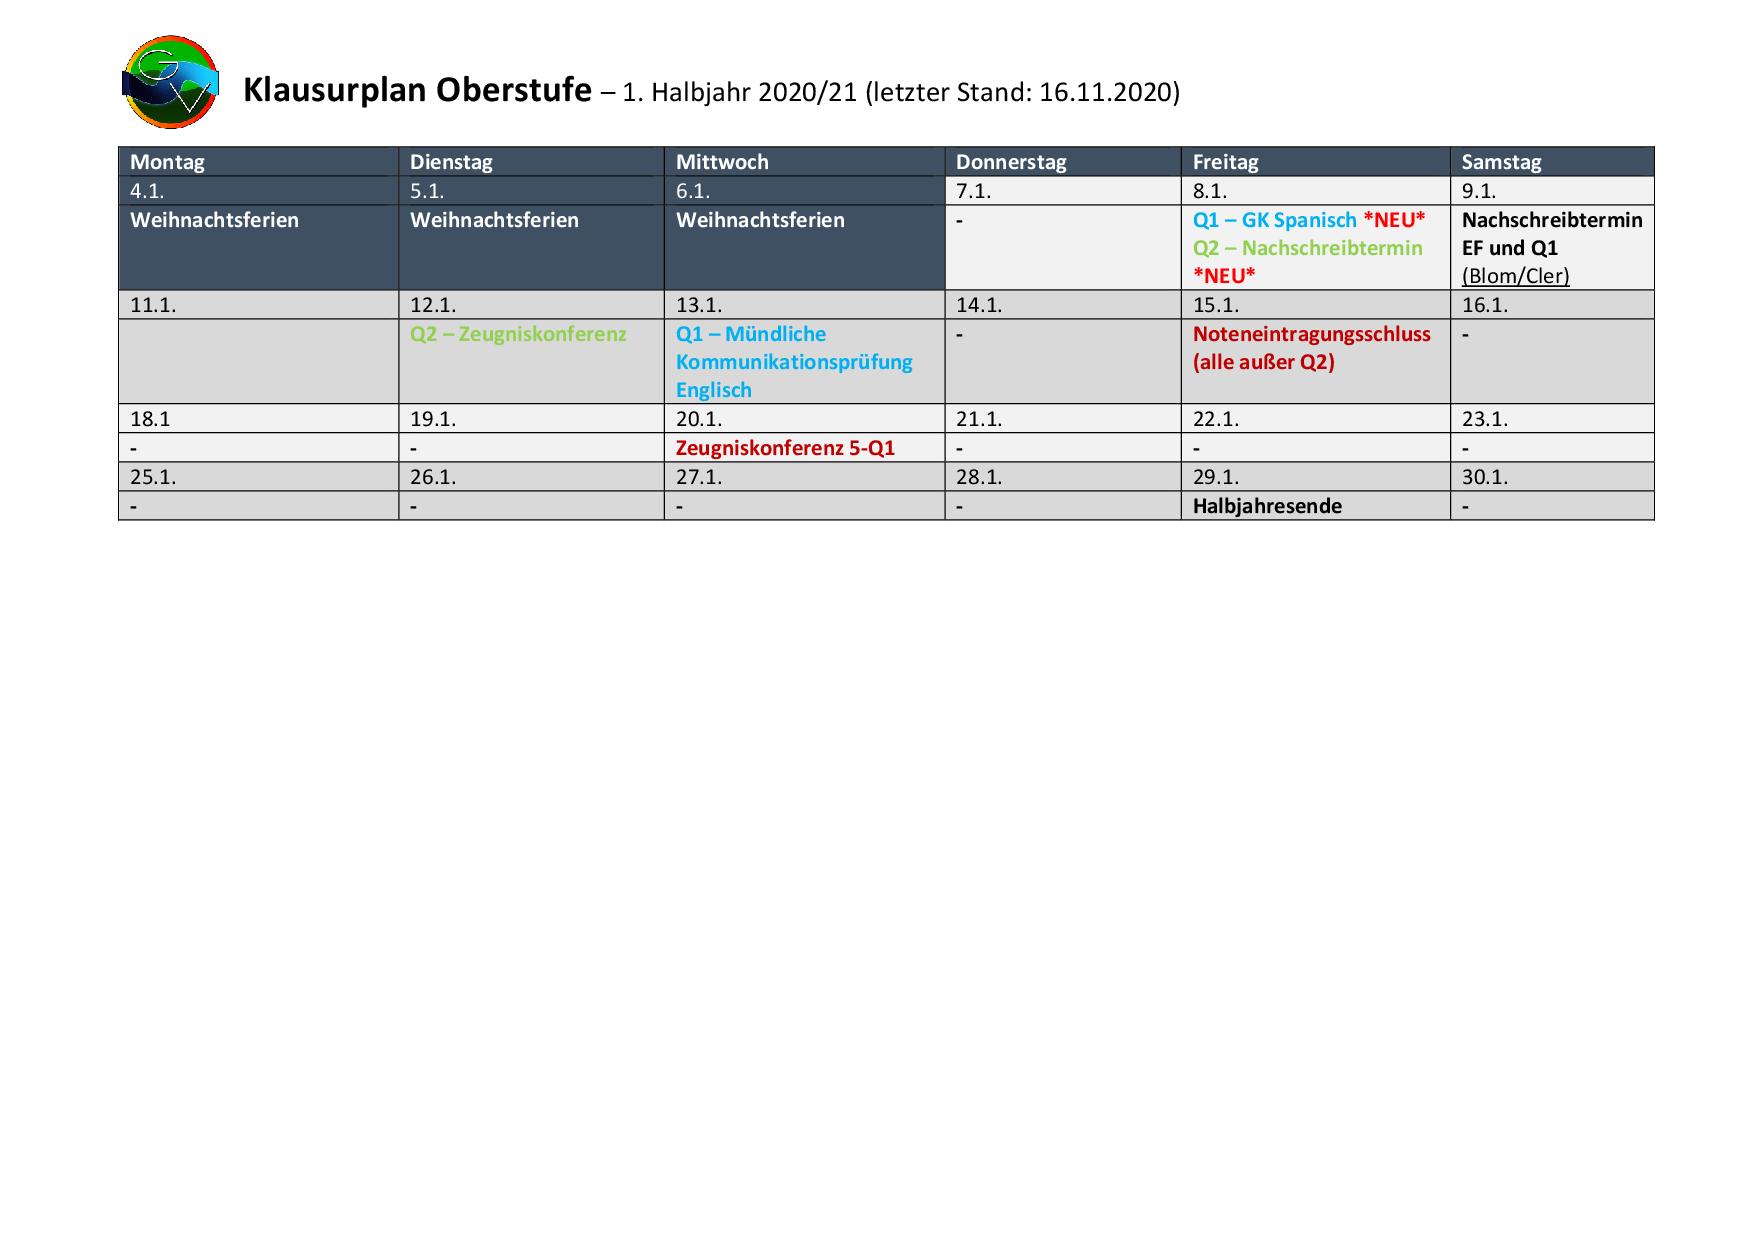 2020-11-16_Klausurplan-Oberstufe-1HJ-004